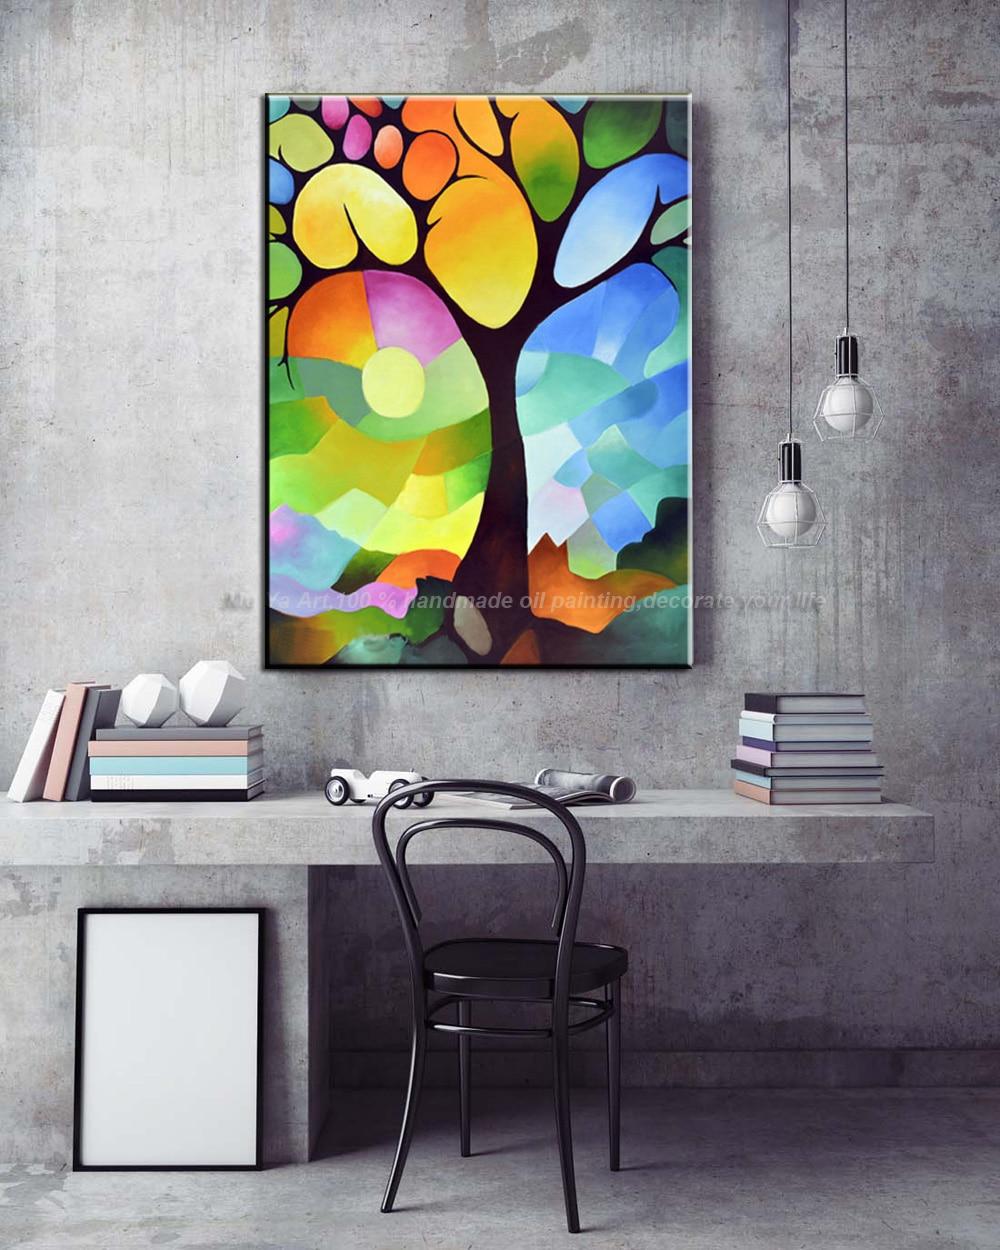 Compra cuadros decorativos para ba os online al por mayor for Lienzos para salon modernos